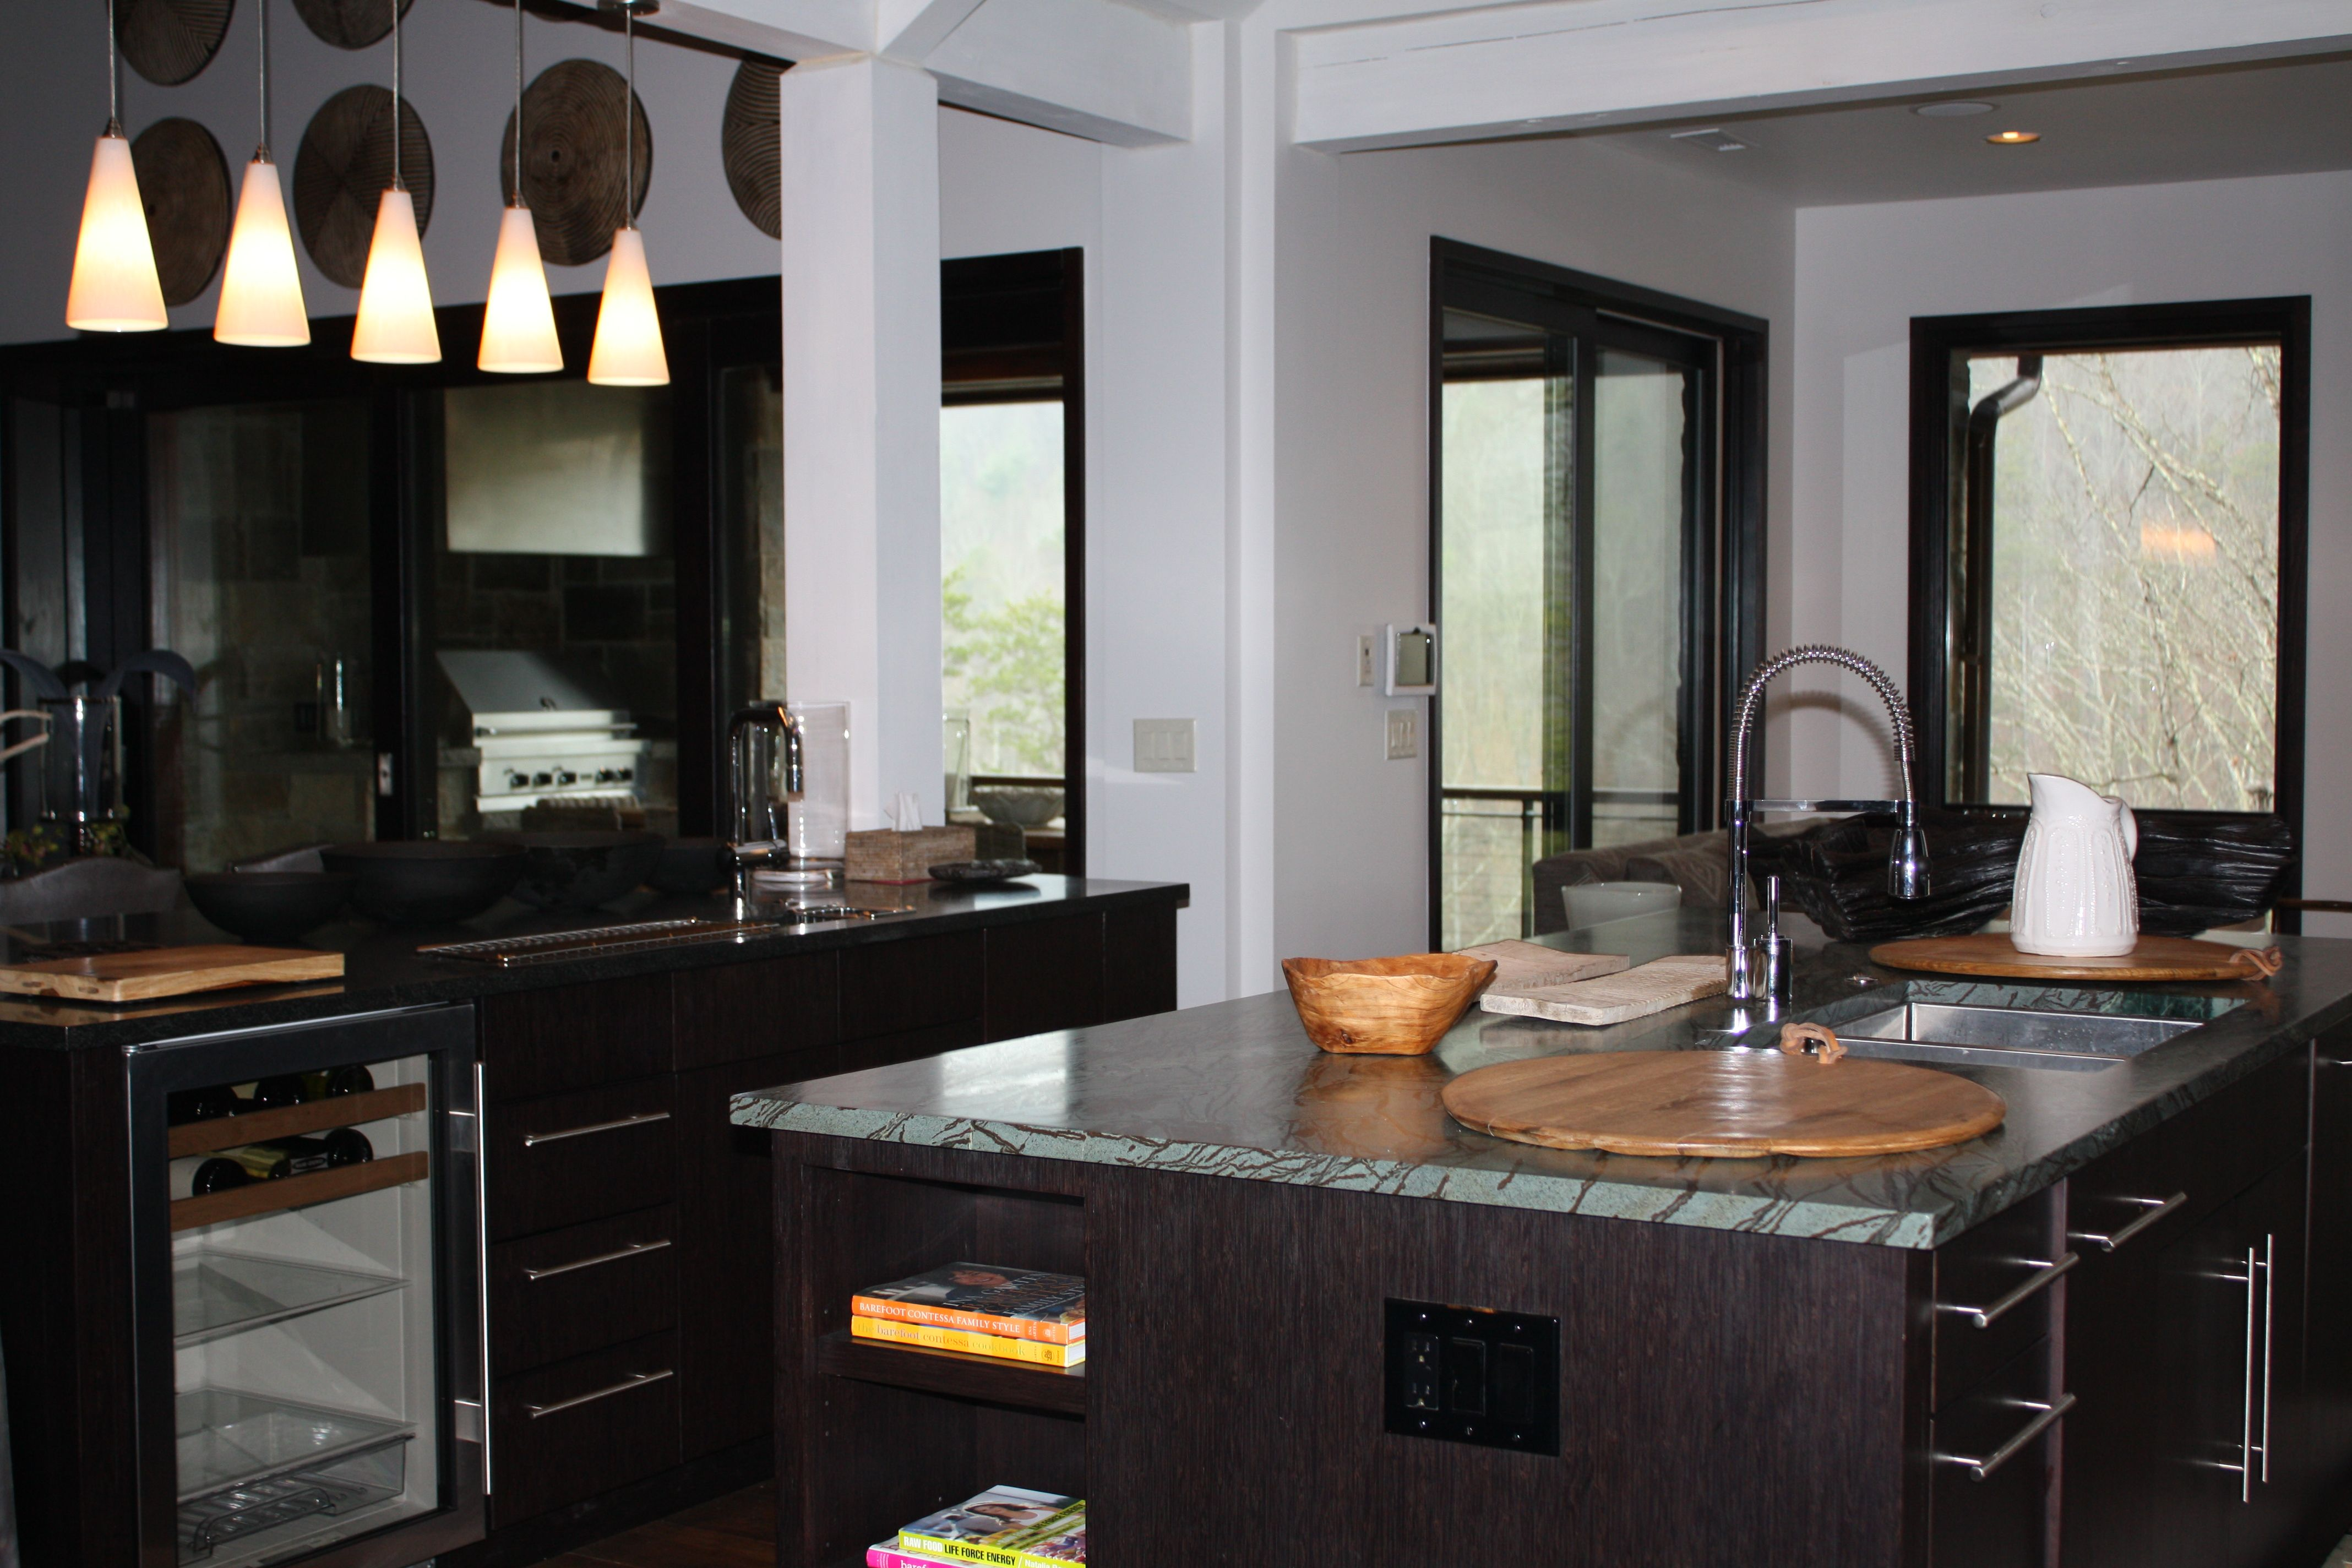 Interior Design U2022 Greenville, SC U2022 Interior Cues, LLC